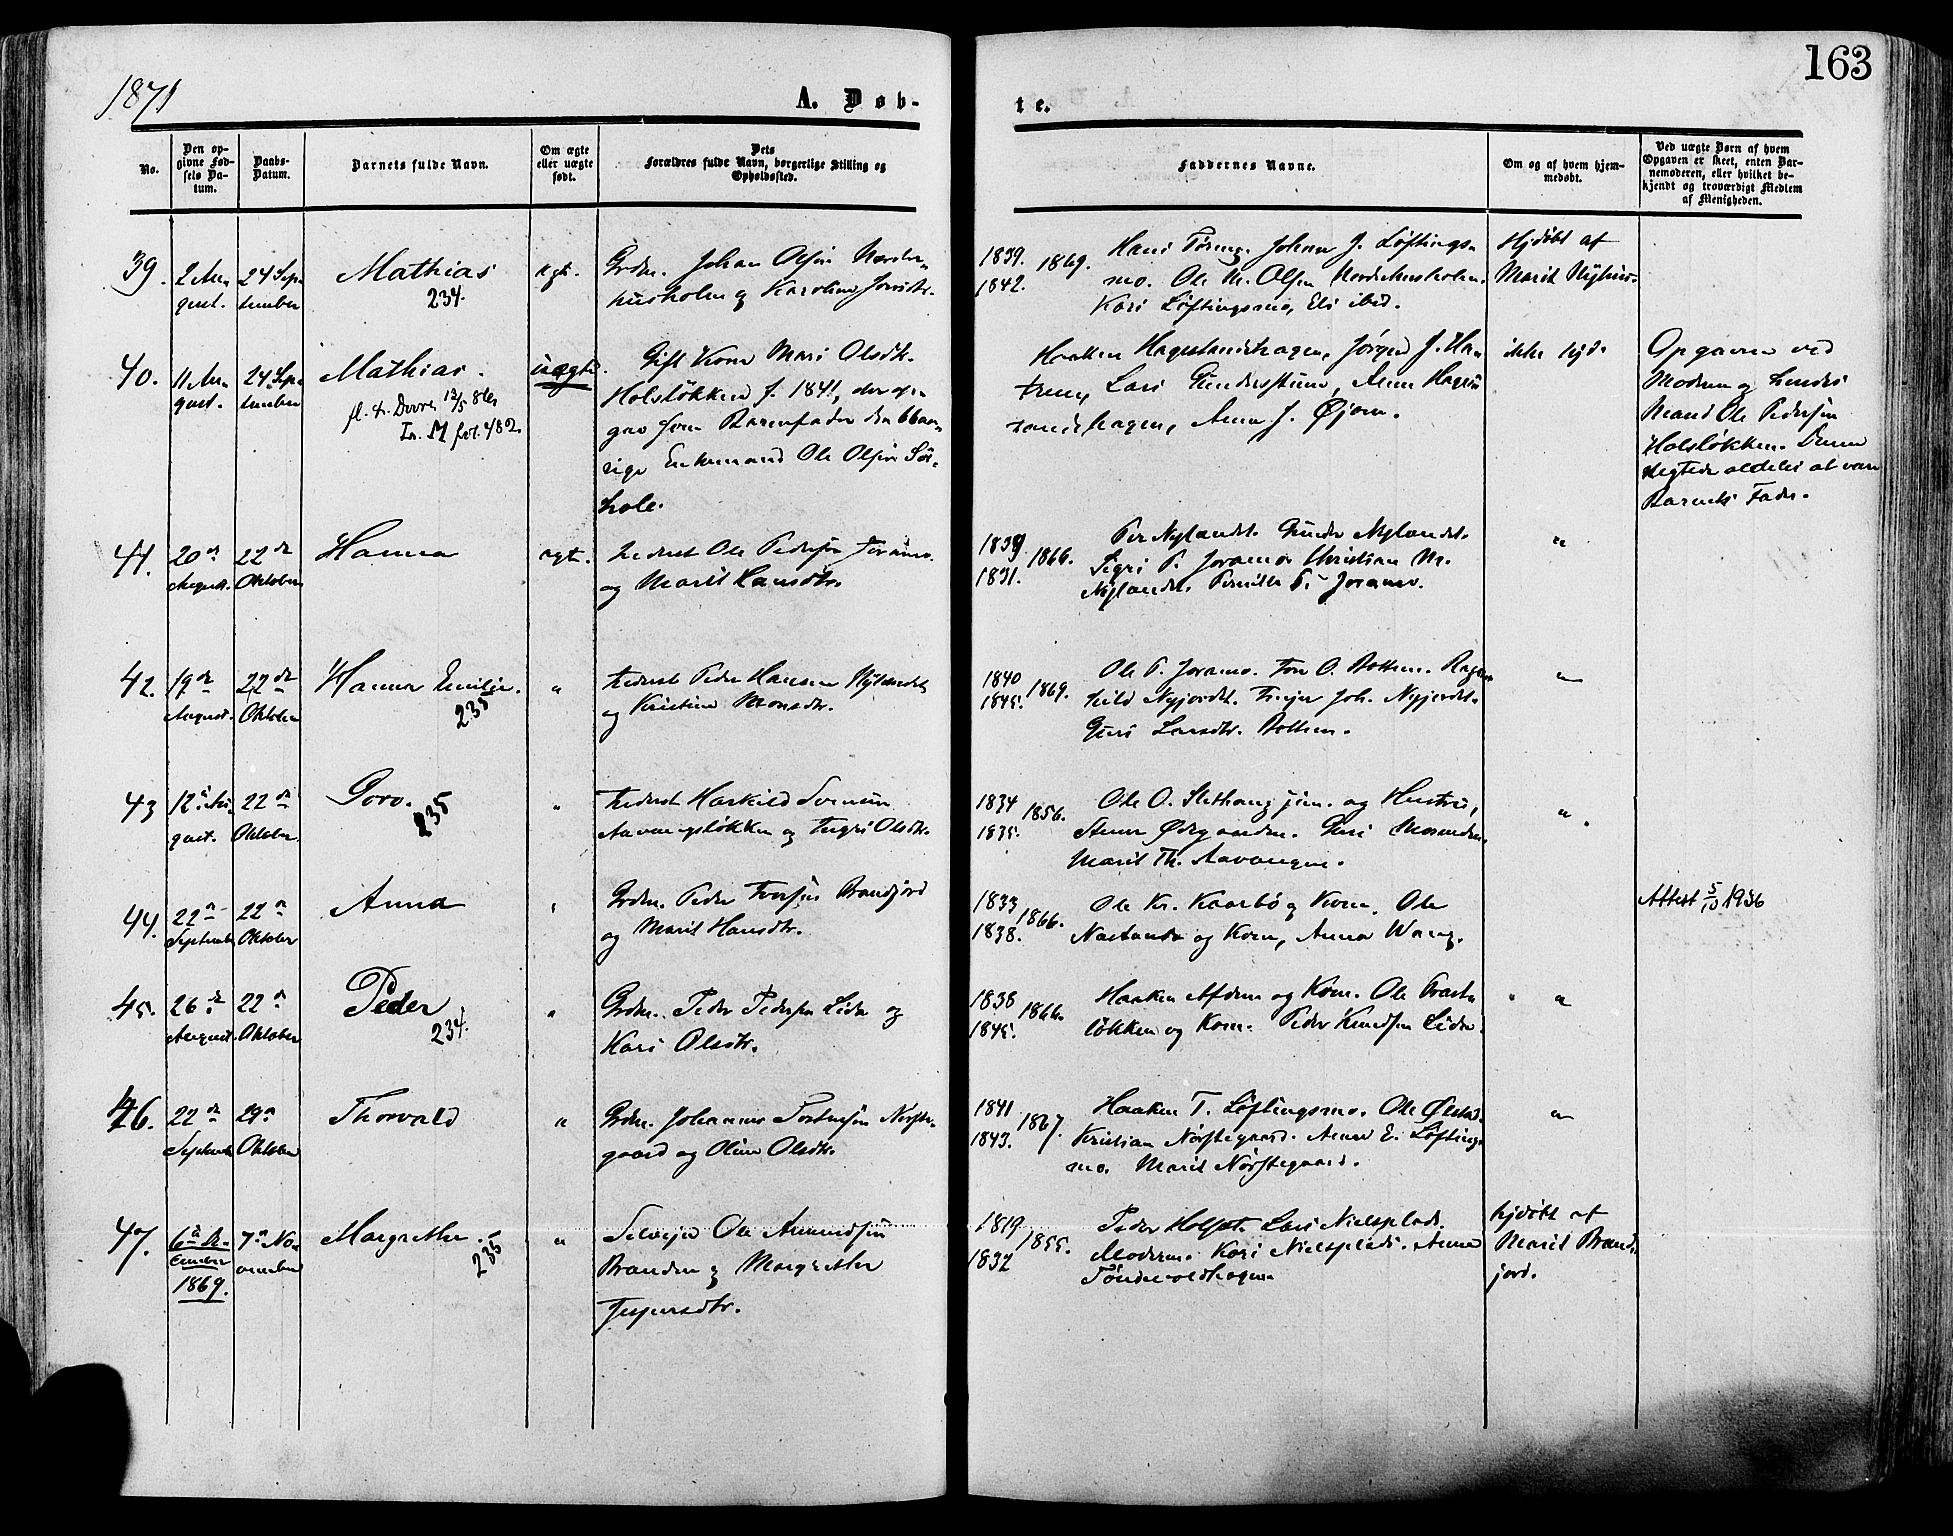 SAH, Lesja prestekontor, Ministerialbok nr. 8, 1854-1880, s. 163